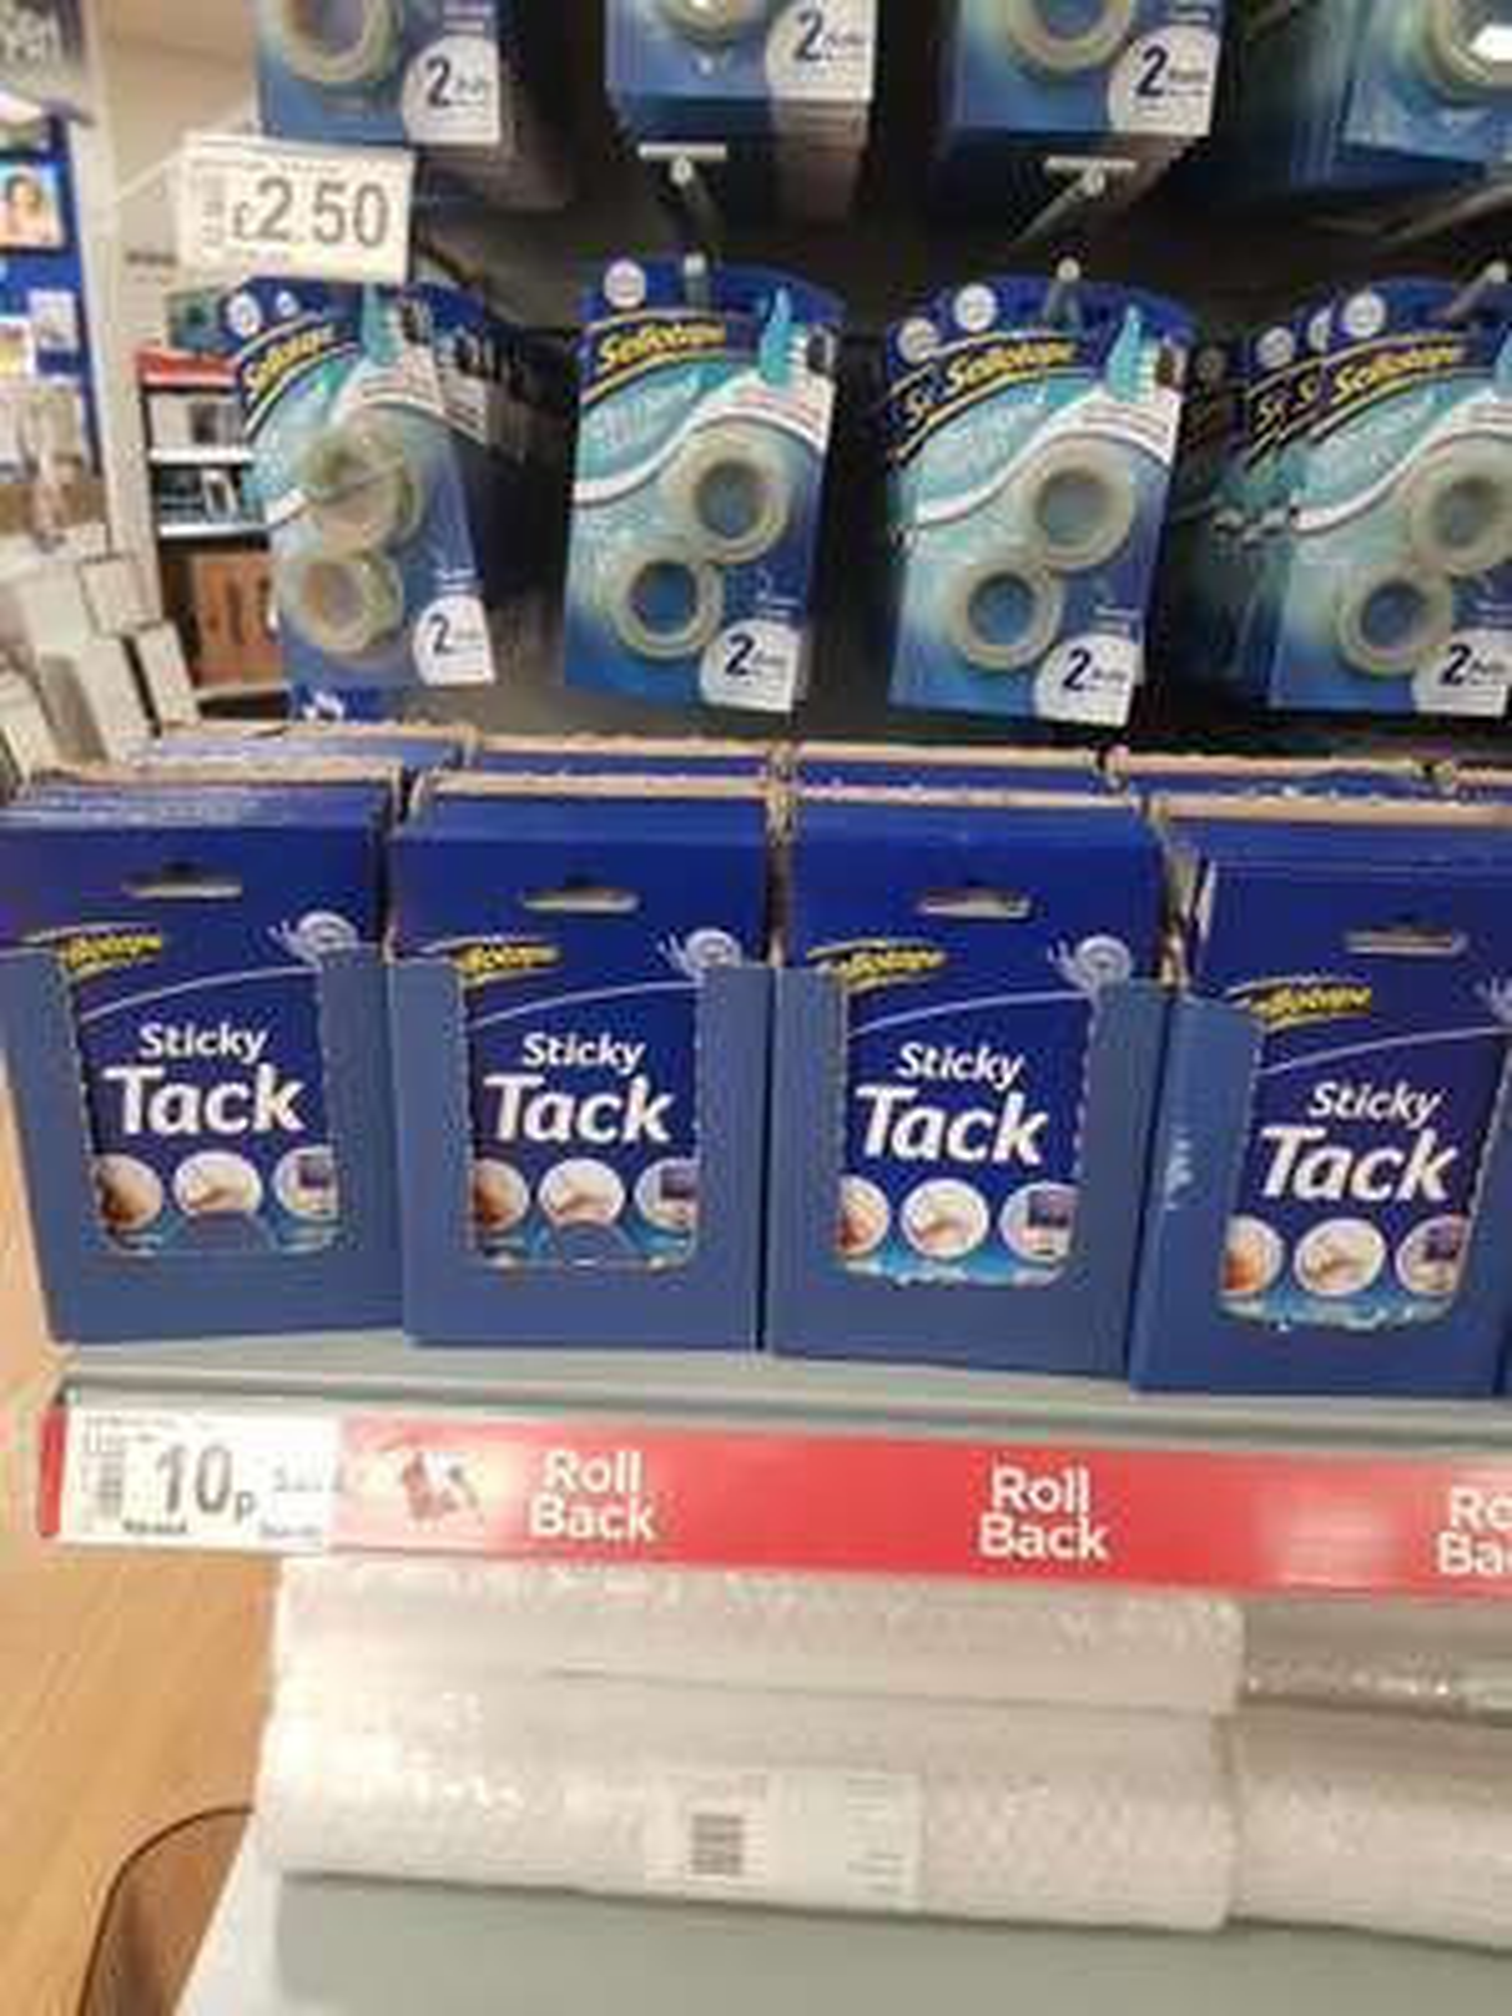 Sellotape blu tack 10p @ asda Ipswich white house store may be national